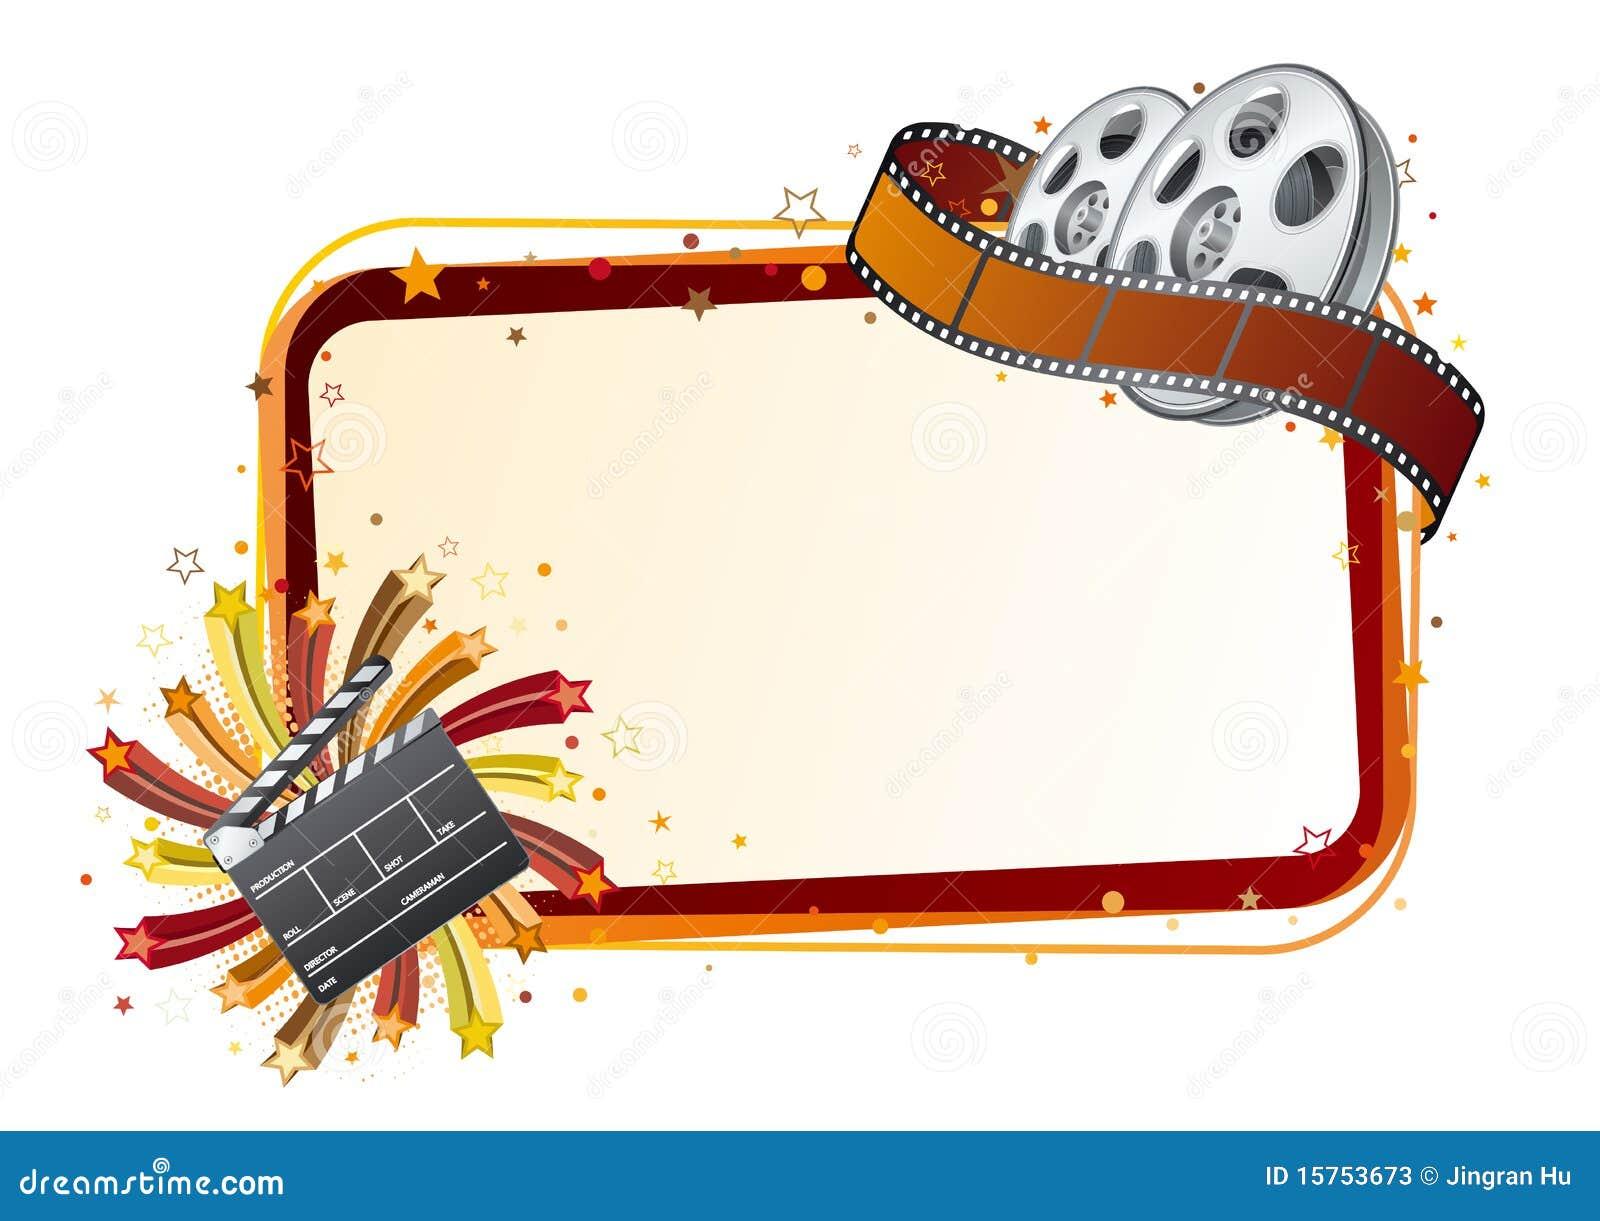 Movie Theme Illustration Stock Vector Illustration Of Filmstrip